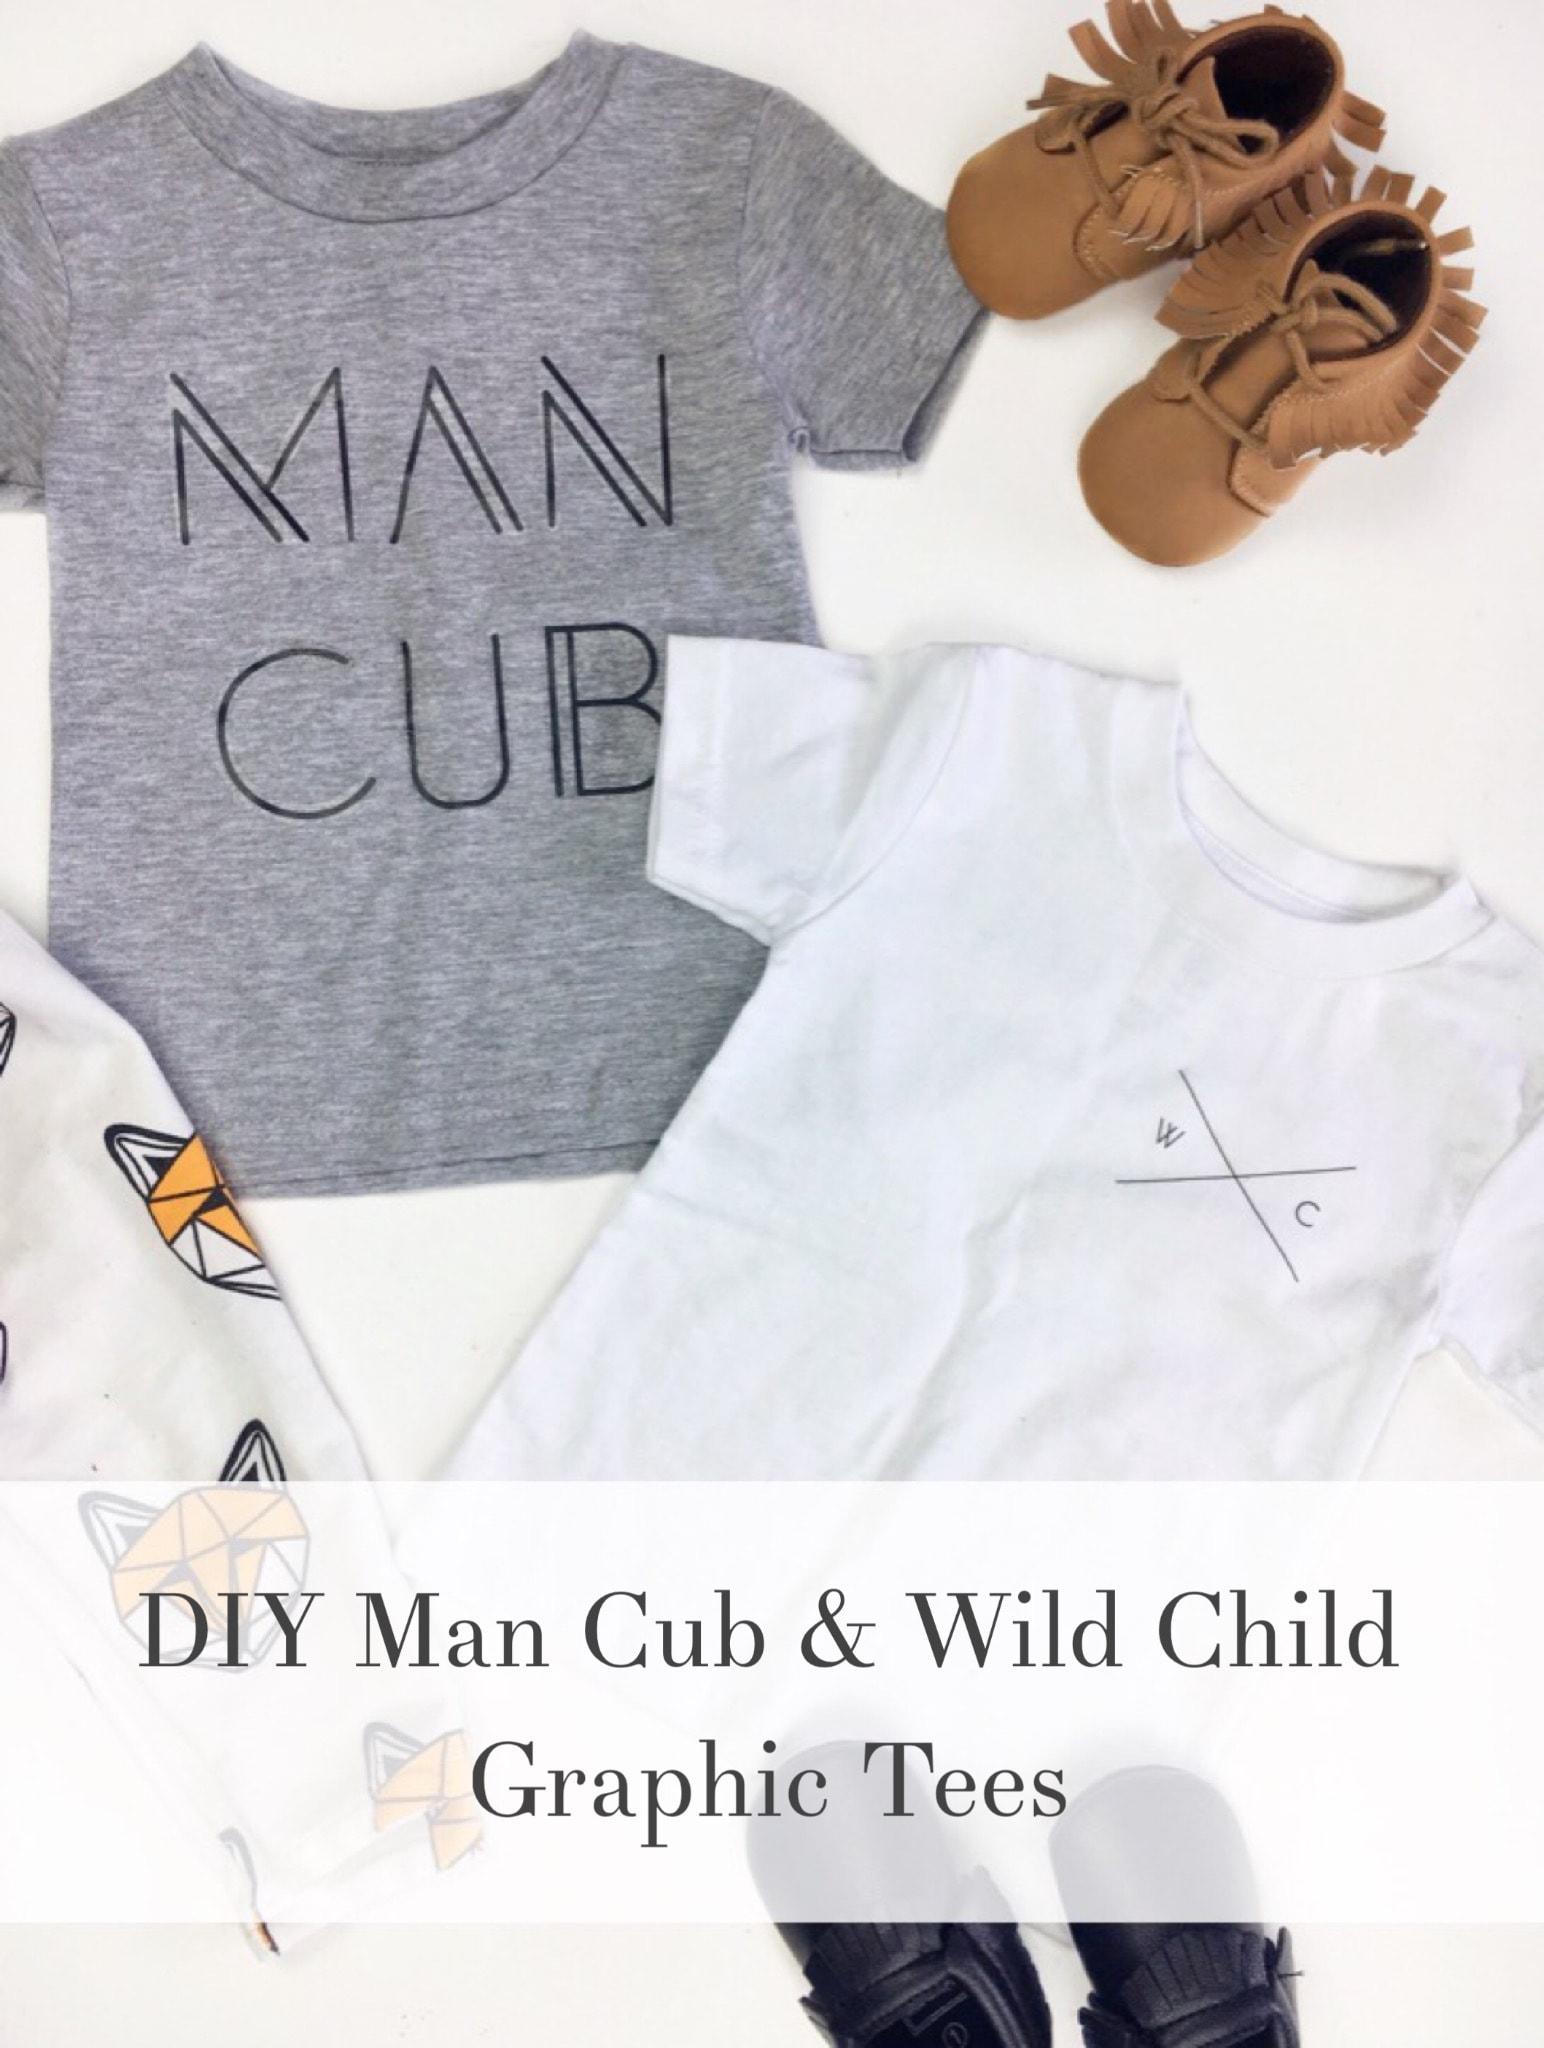 DIY Man Cub & Wild Child Graphic Tees